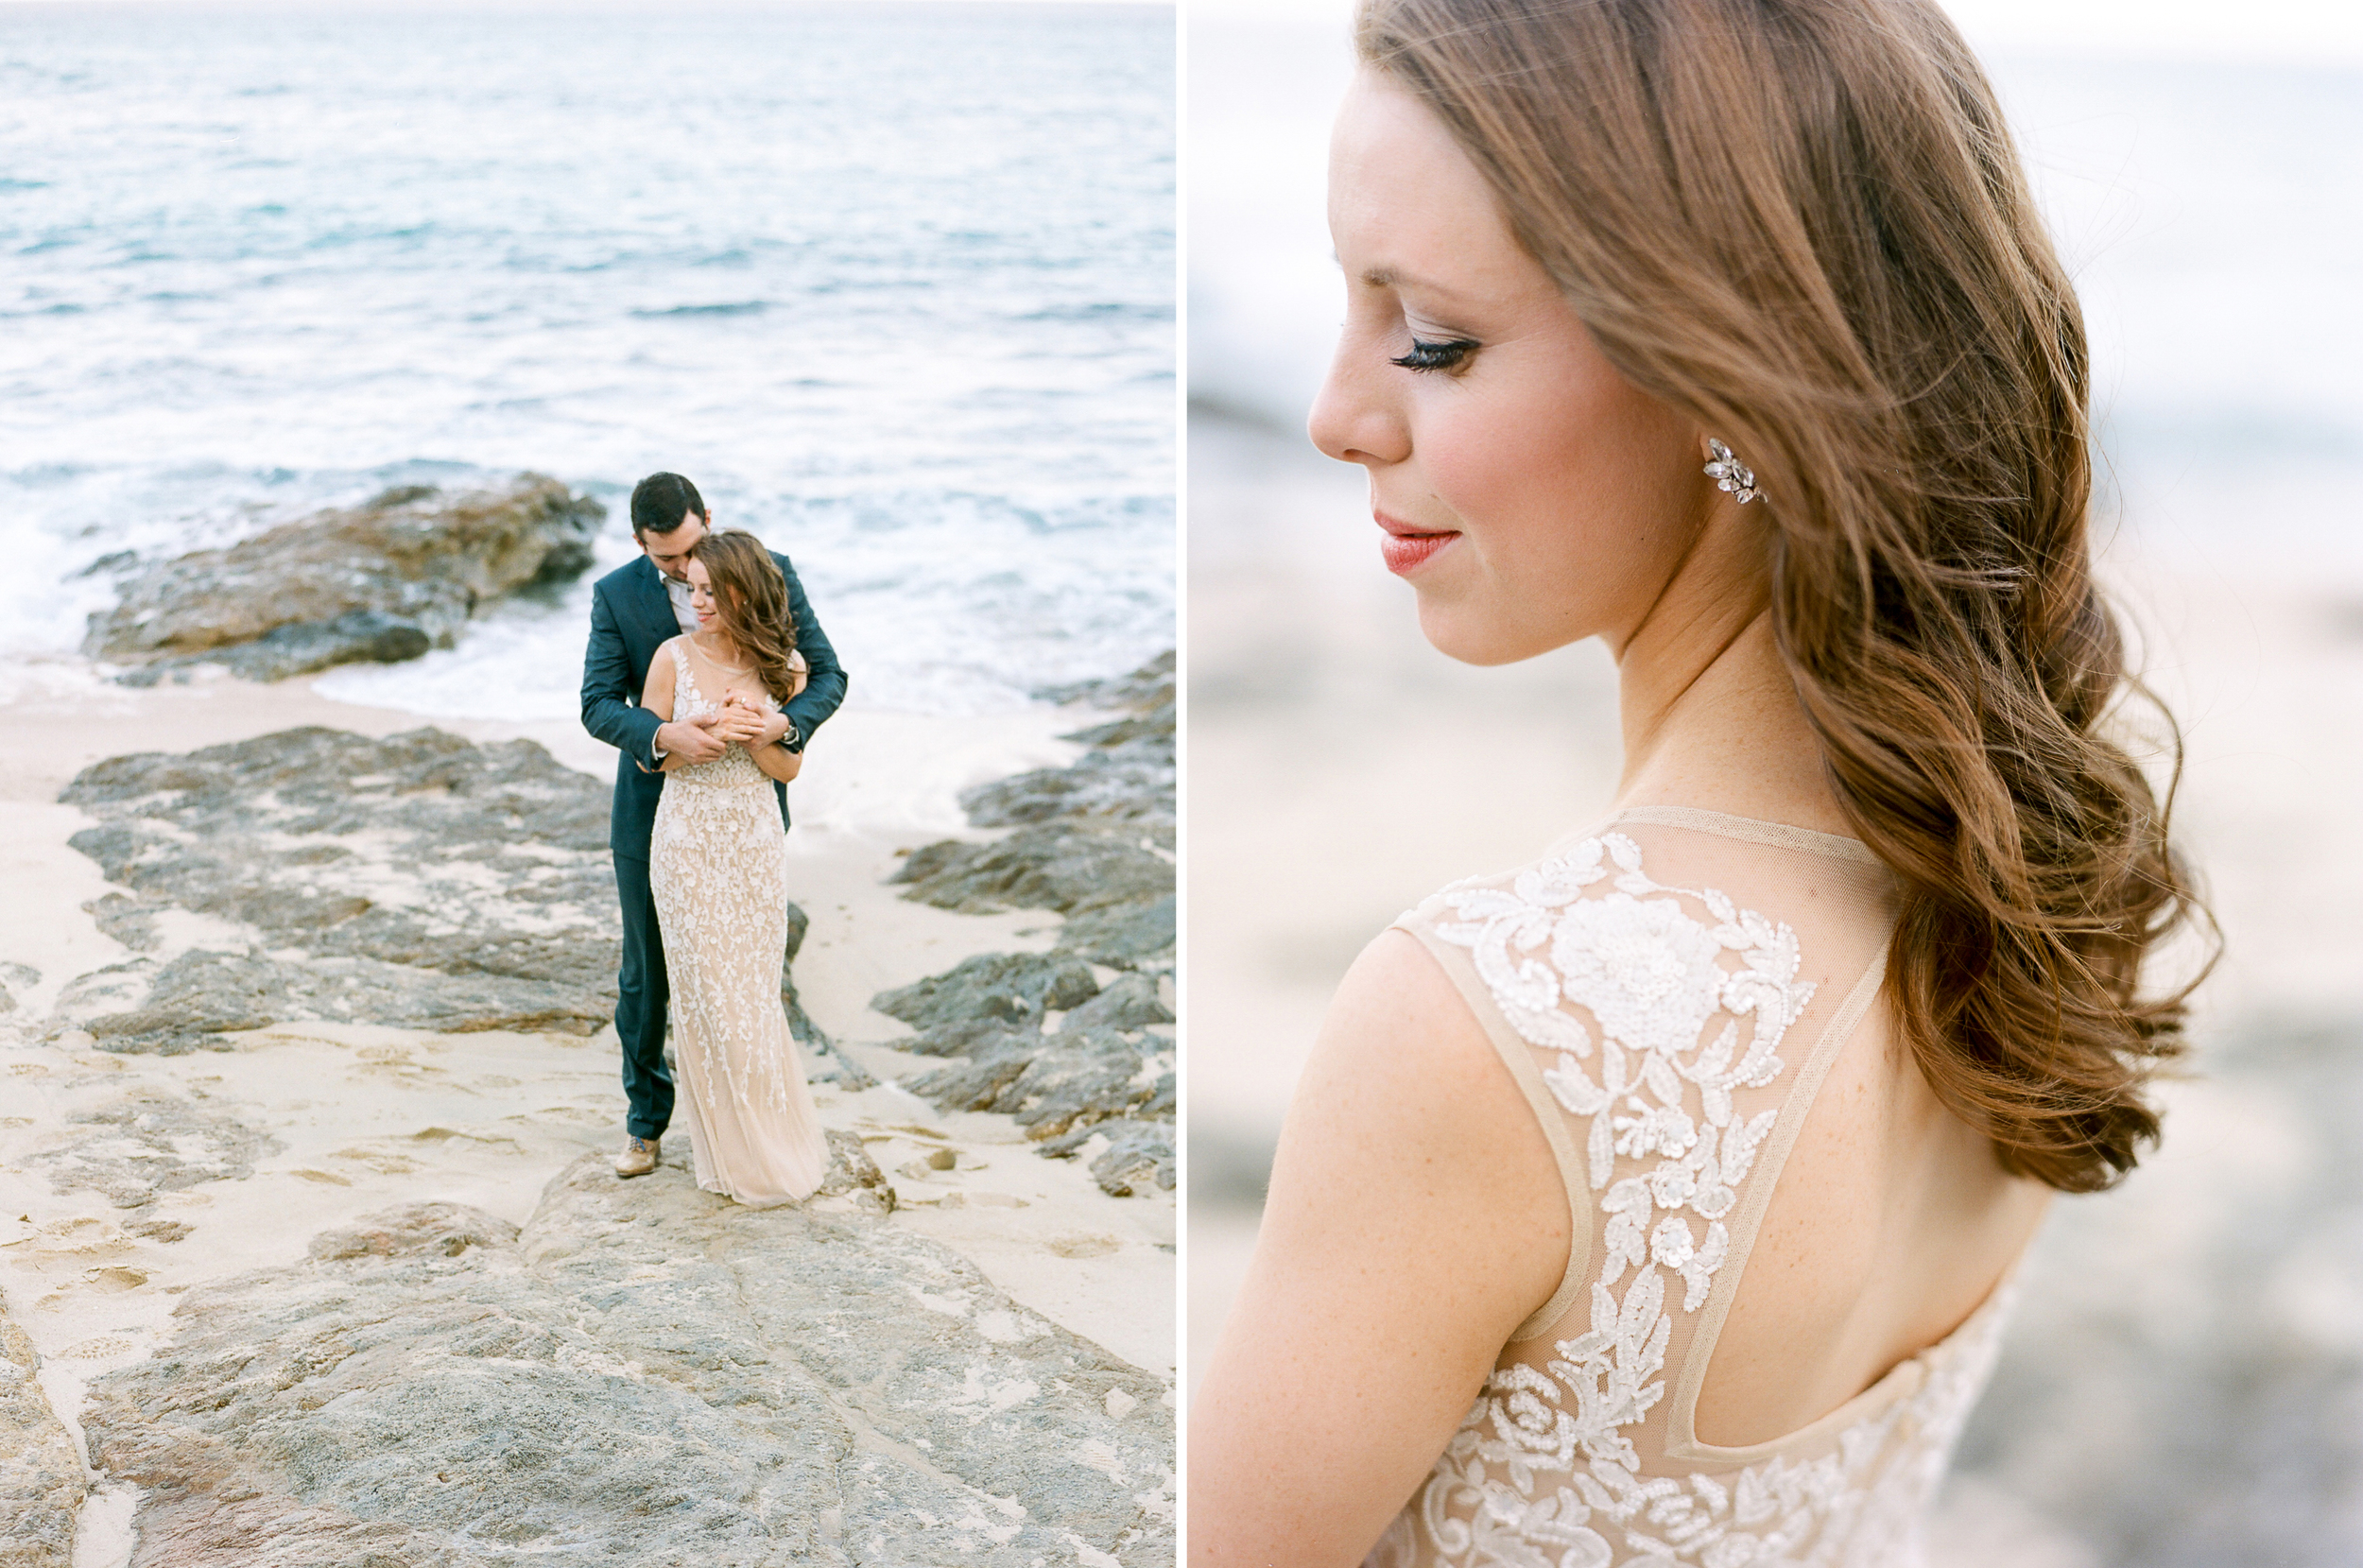 Dana-Fernandez-Photography-Destination-Wedding-Photographer-Cabo-San-Lucas-Film-Houston-Texas-Cabo-110.jpg